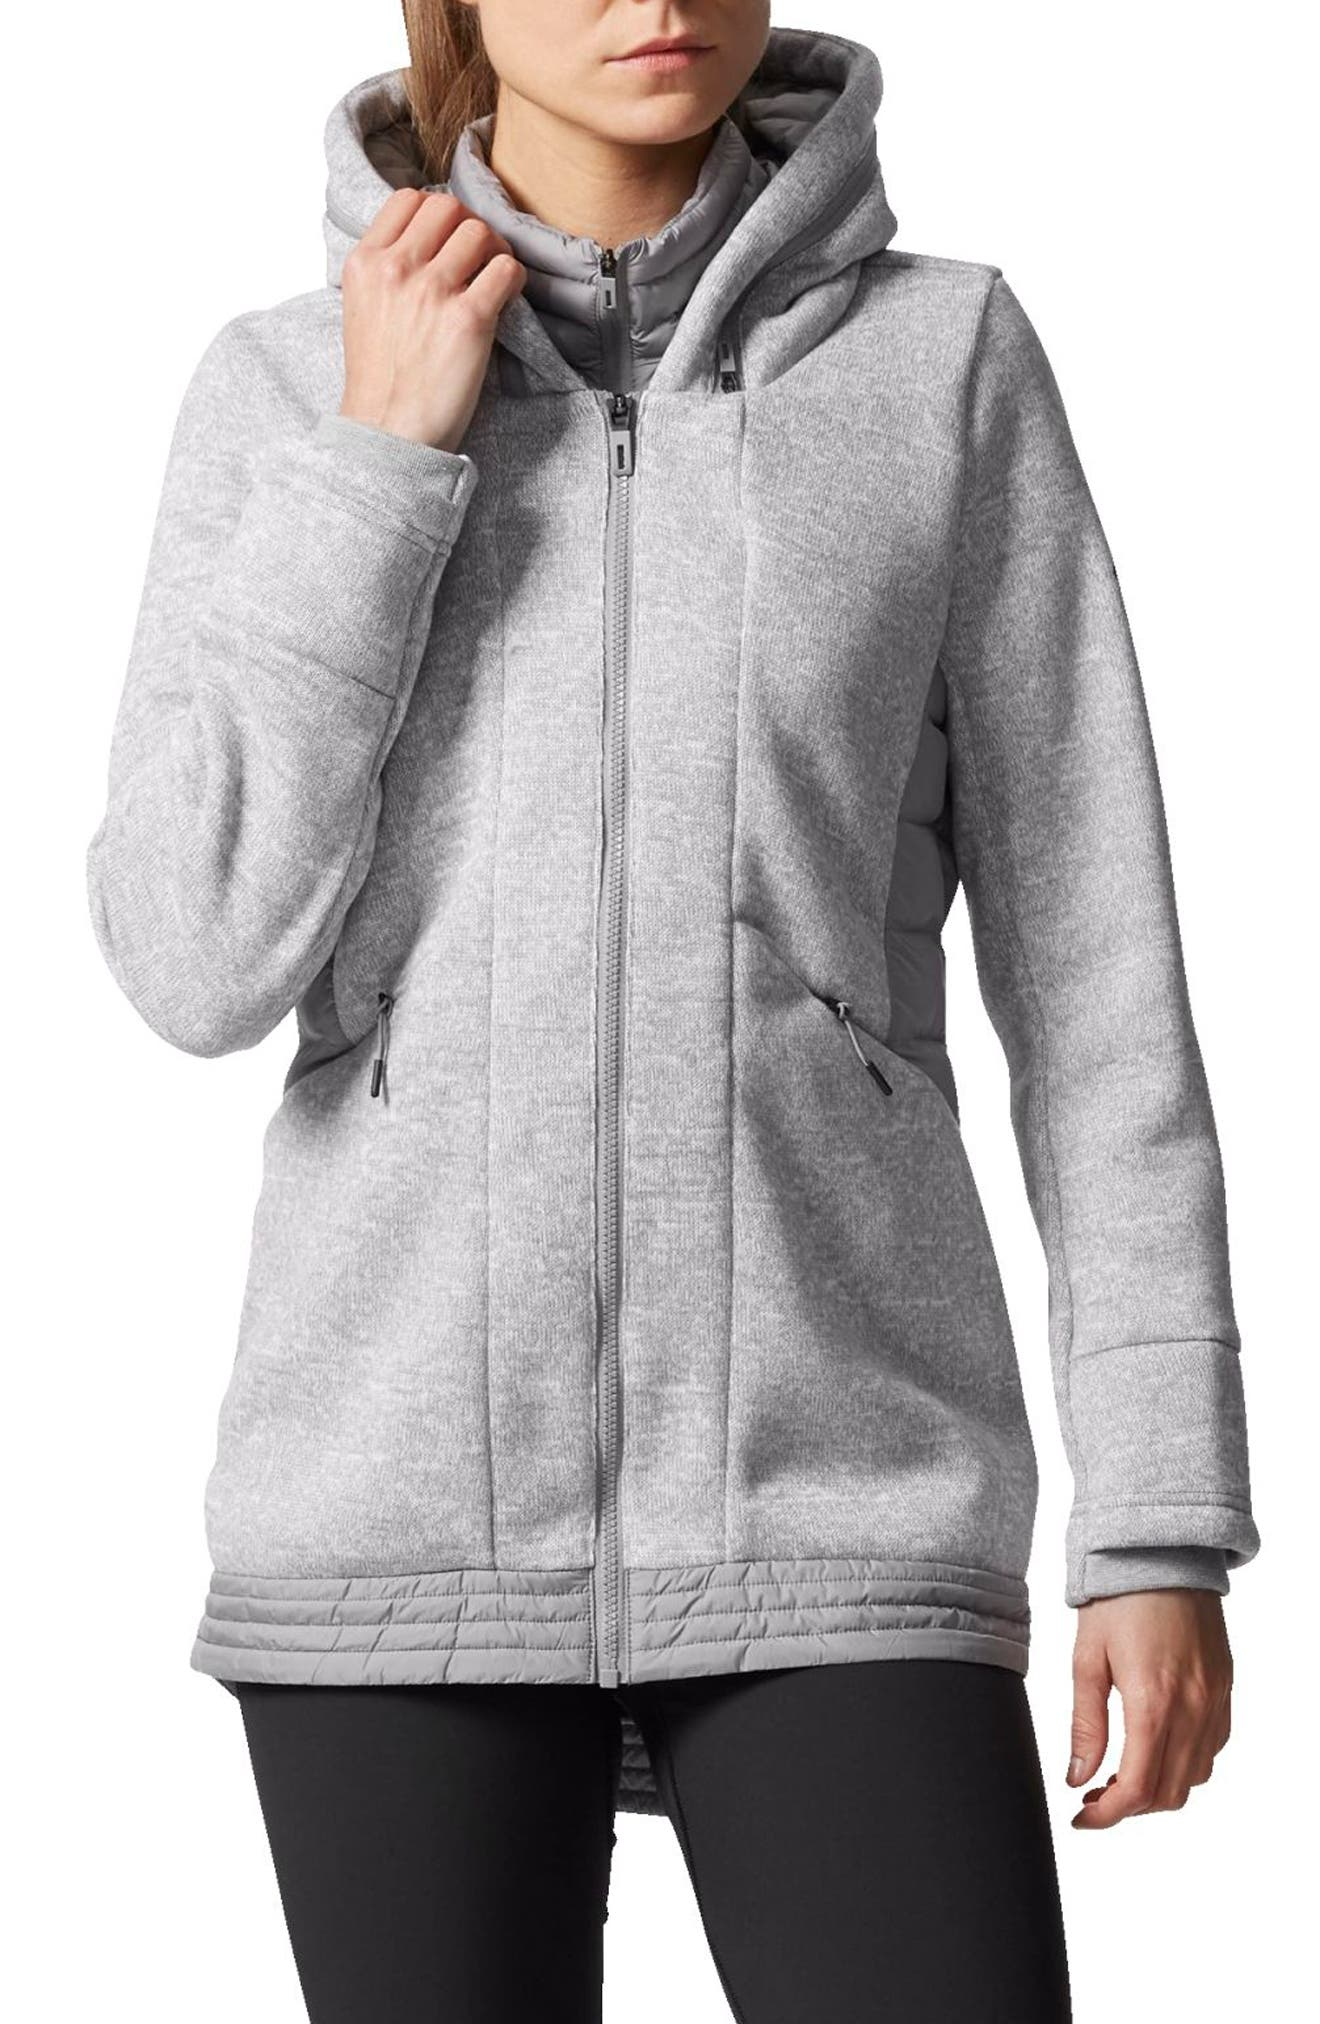 Nuvic Hybrid 2 Fleece/Puffer Jacket,                             Main thumbnail 1, color,                             Medium Grey Heather/Solid Grey